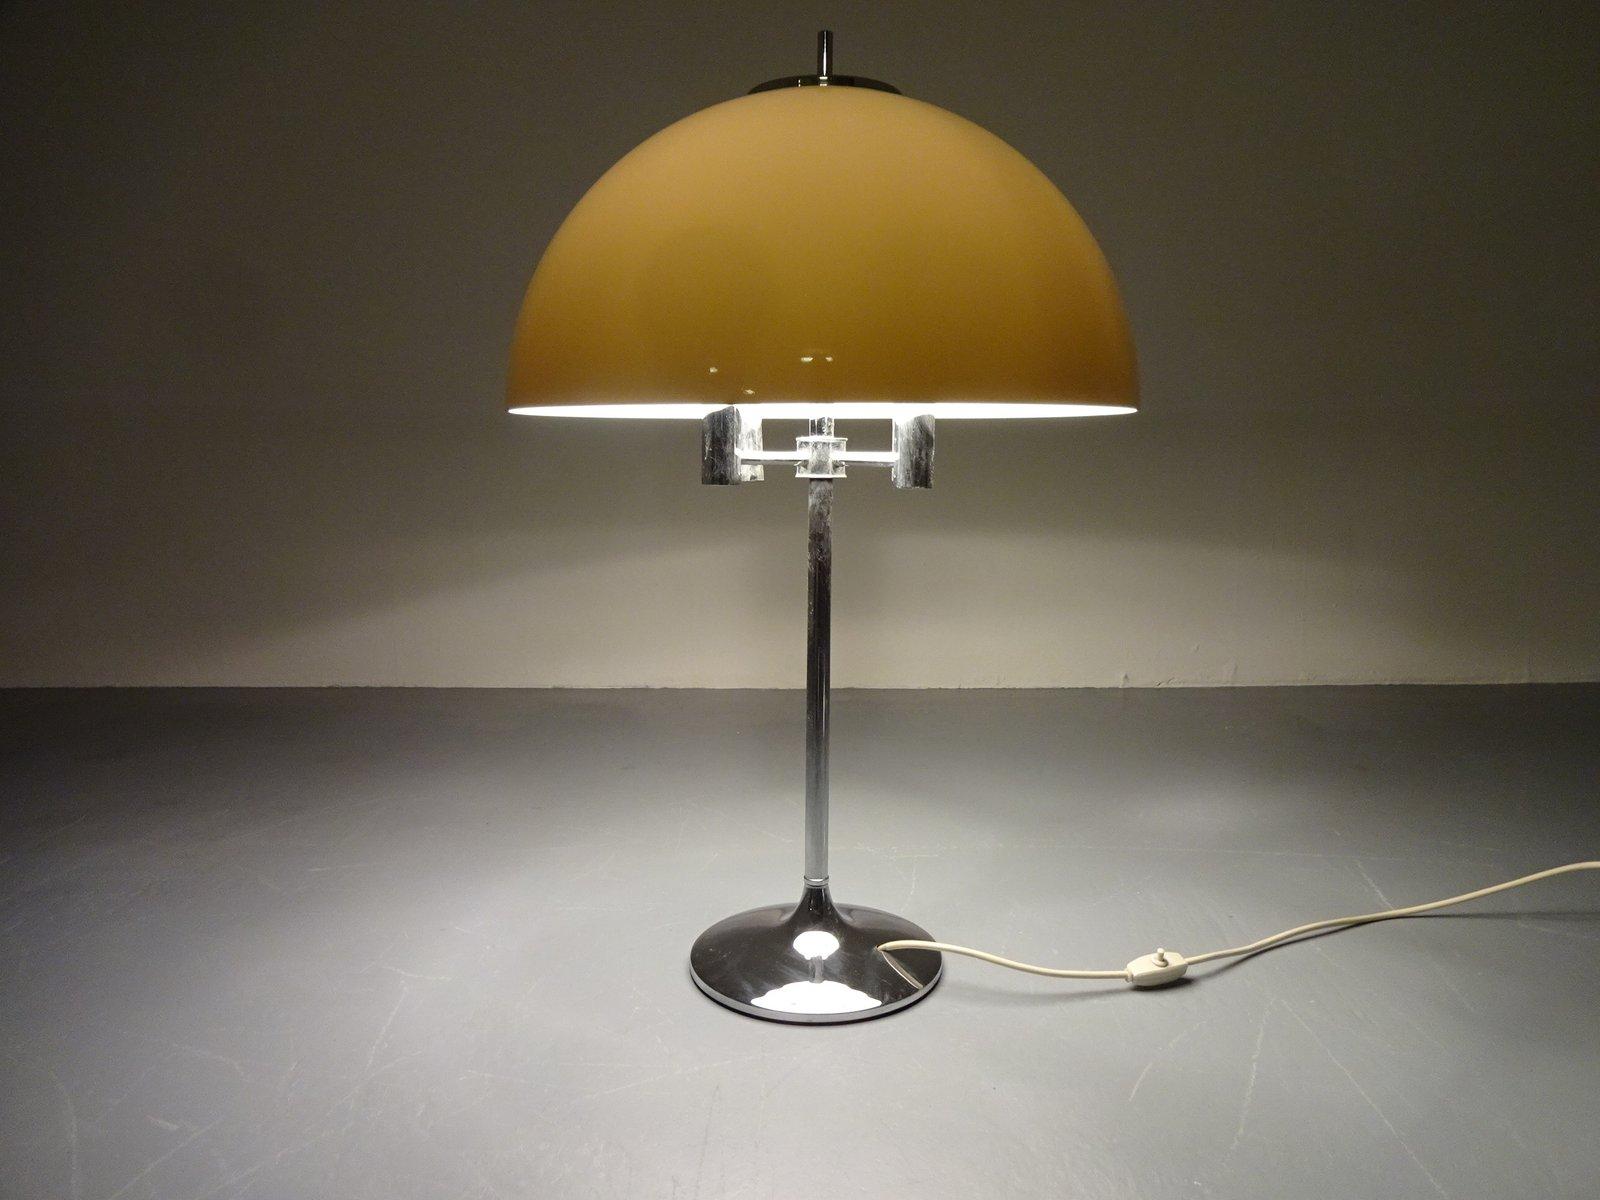 Italienische Tischlampe aus Metall & Kunststoff, 1970er